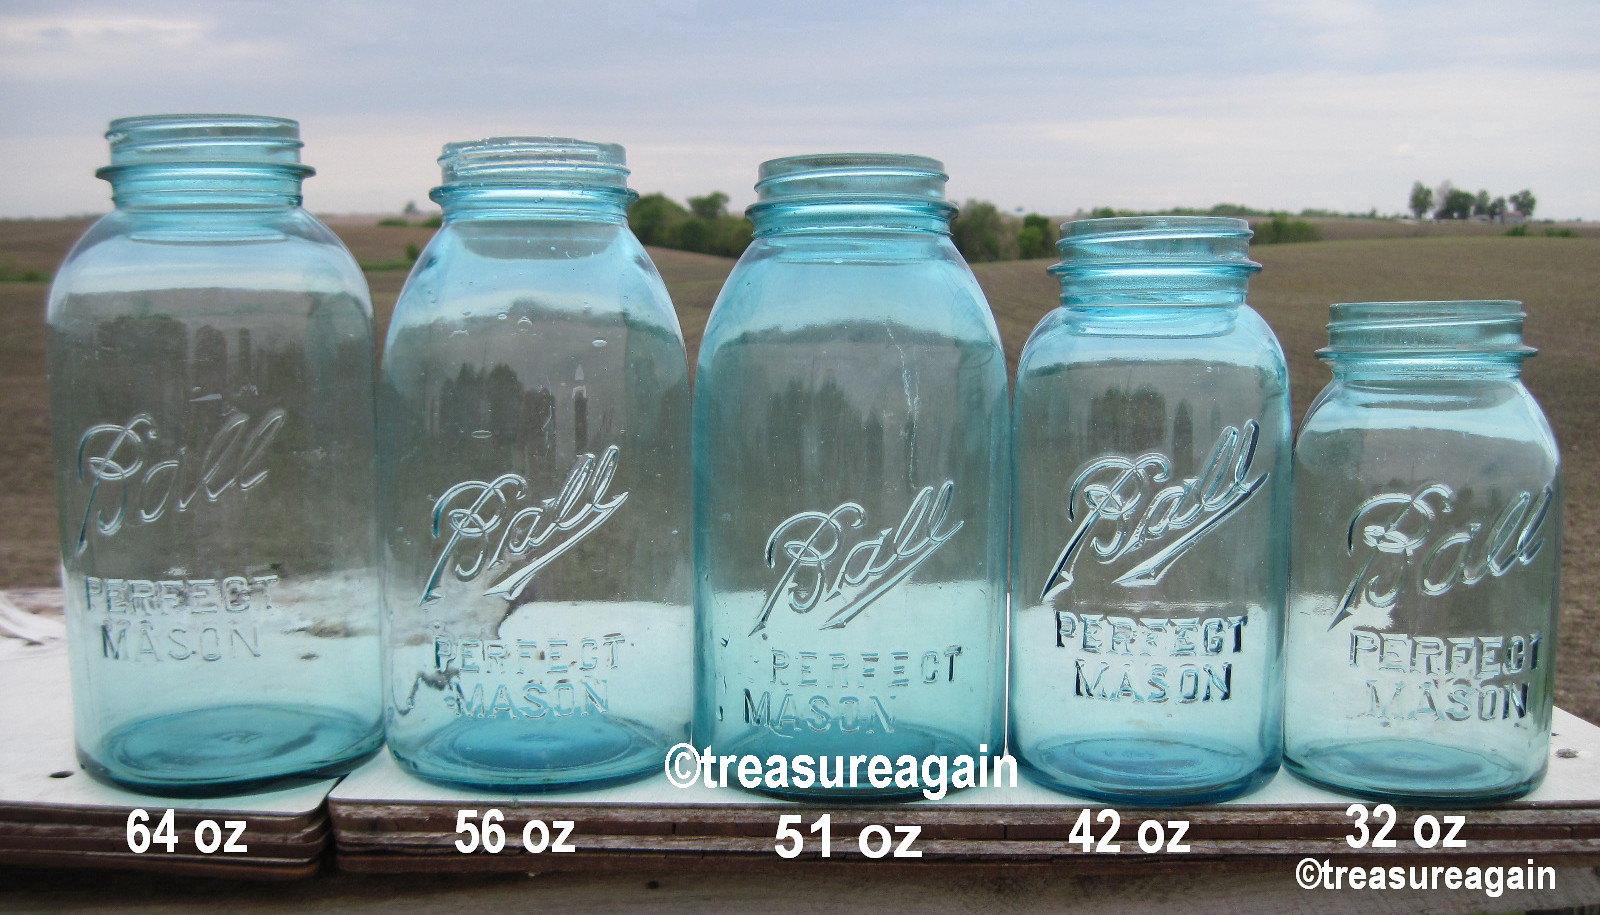 ball mason jar sizes comparison flickr. Black Bedroom Furniture Sets. Home Design Ideas